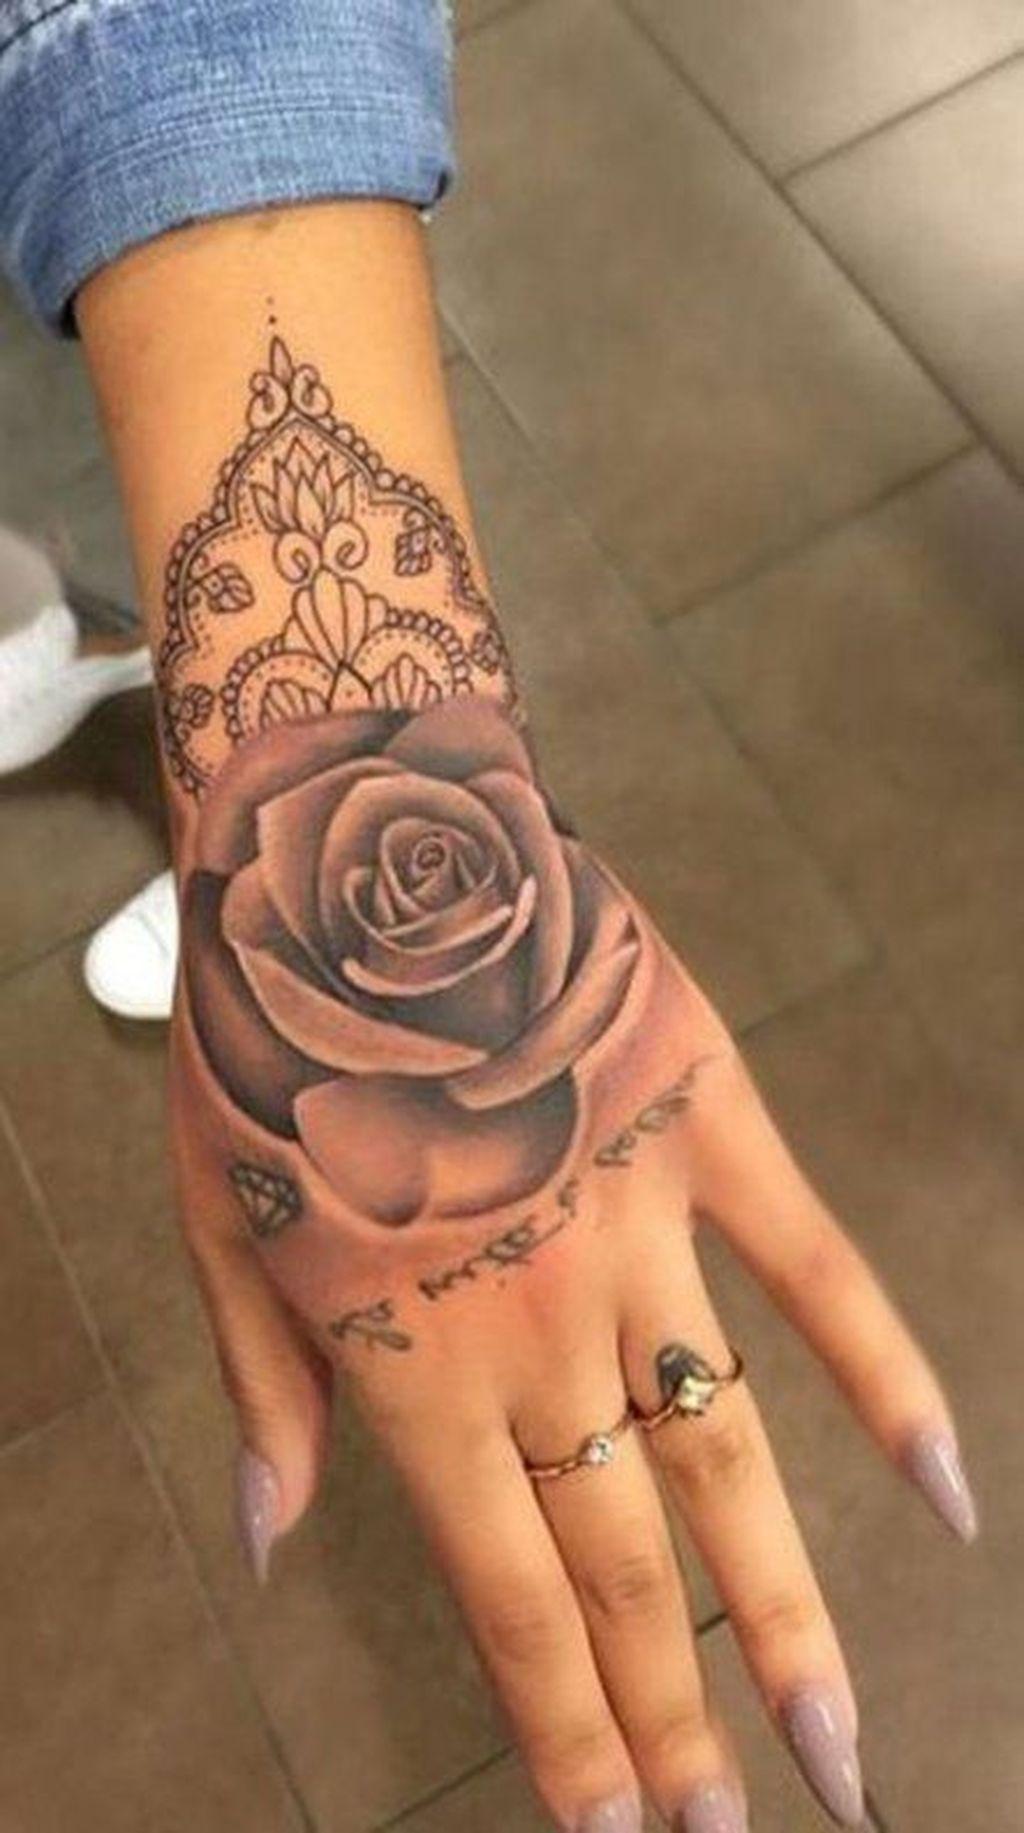 40 Interesting Hand Tattoos Ideas For Women Rose Hand Tattoo